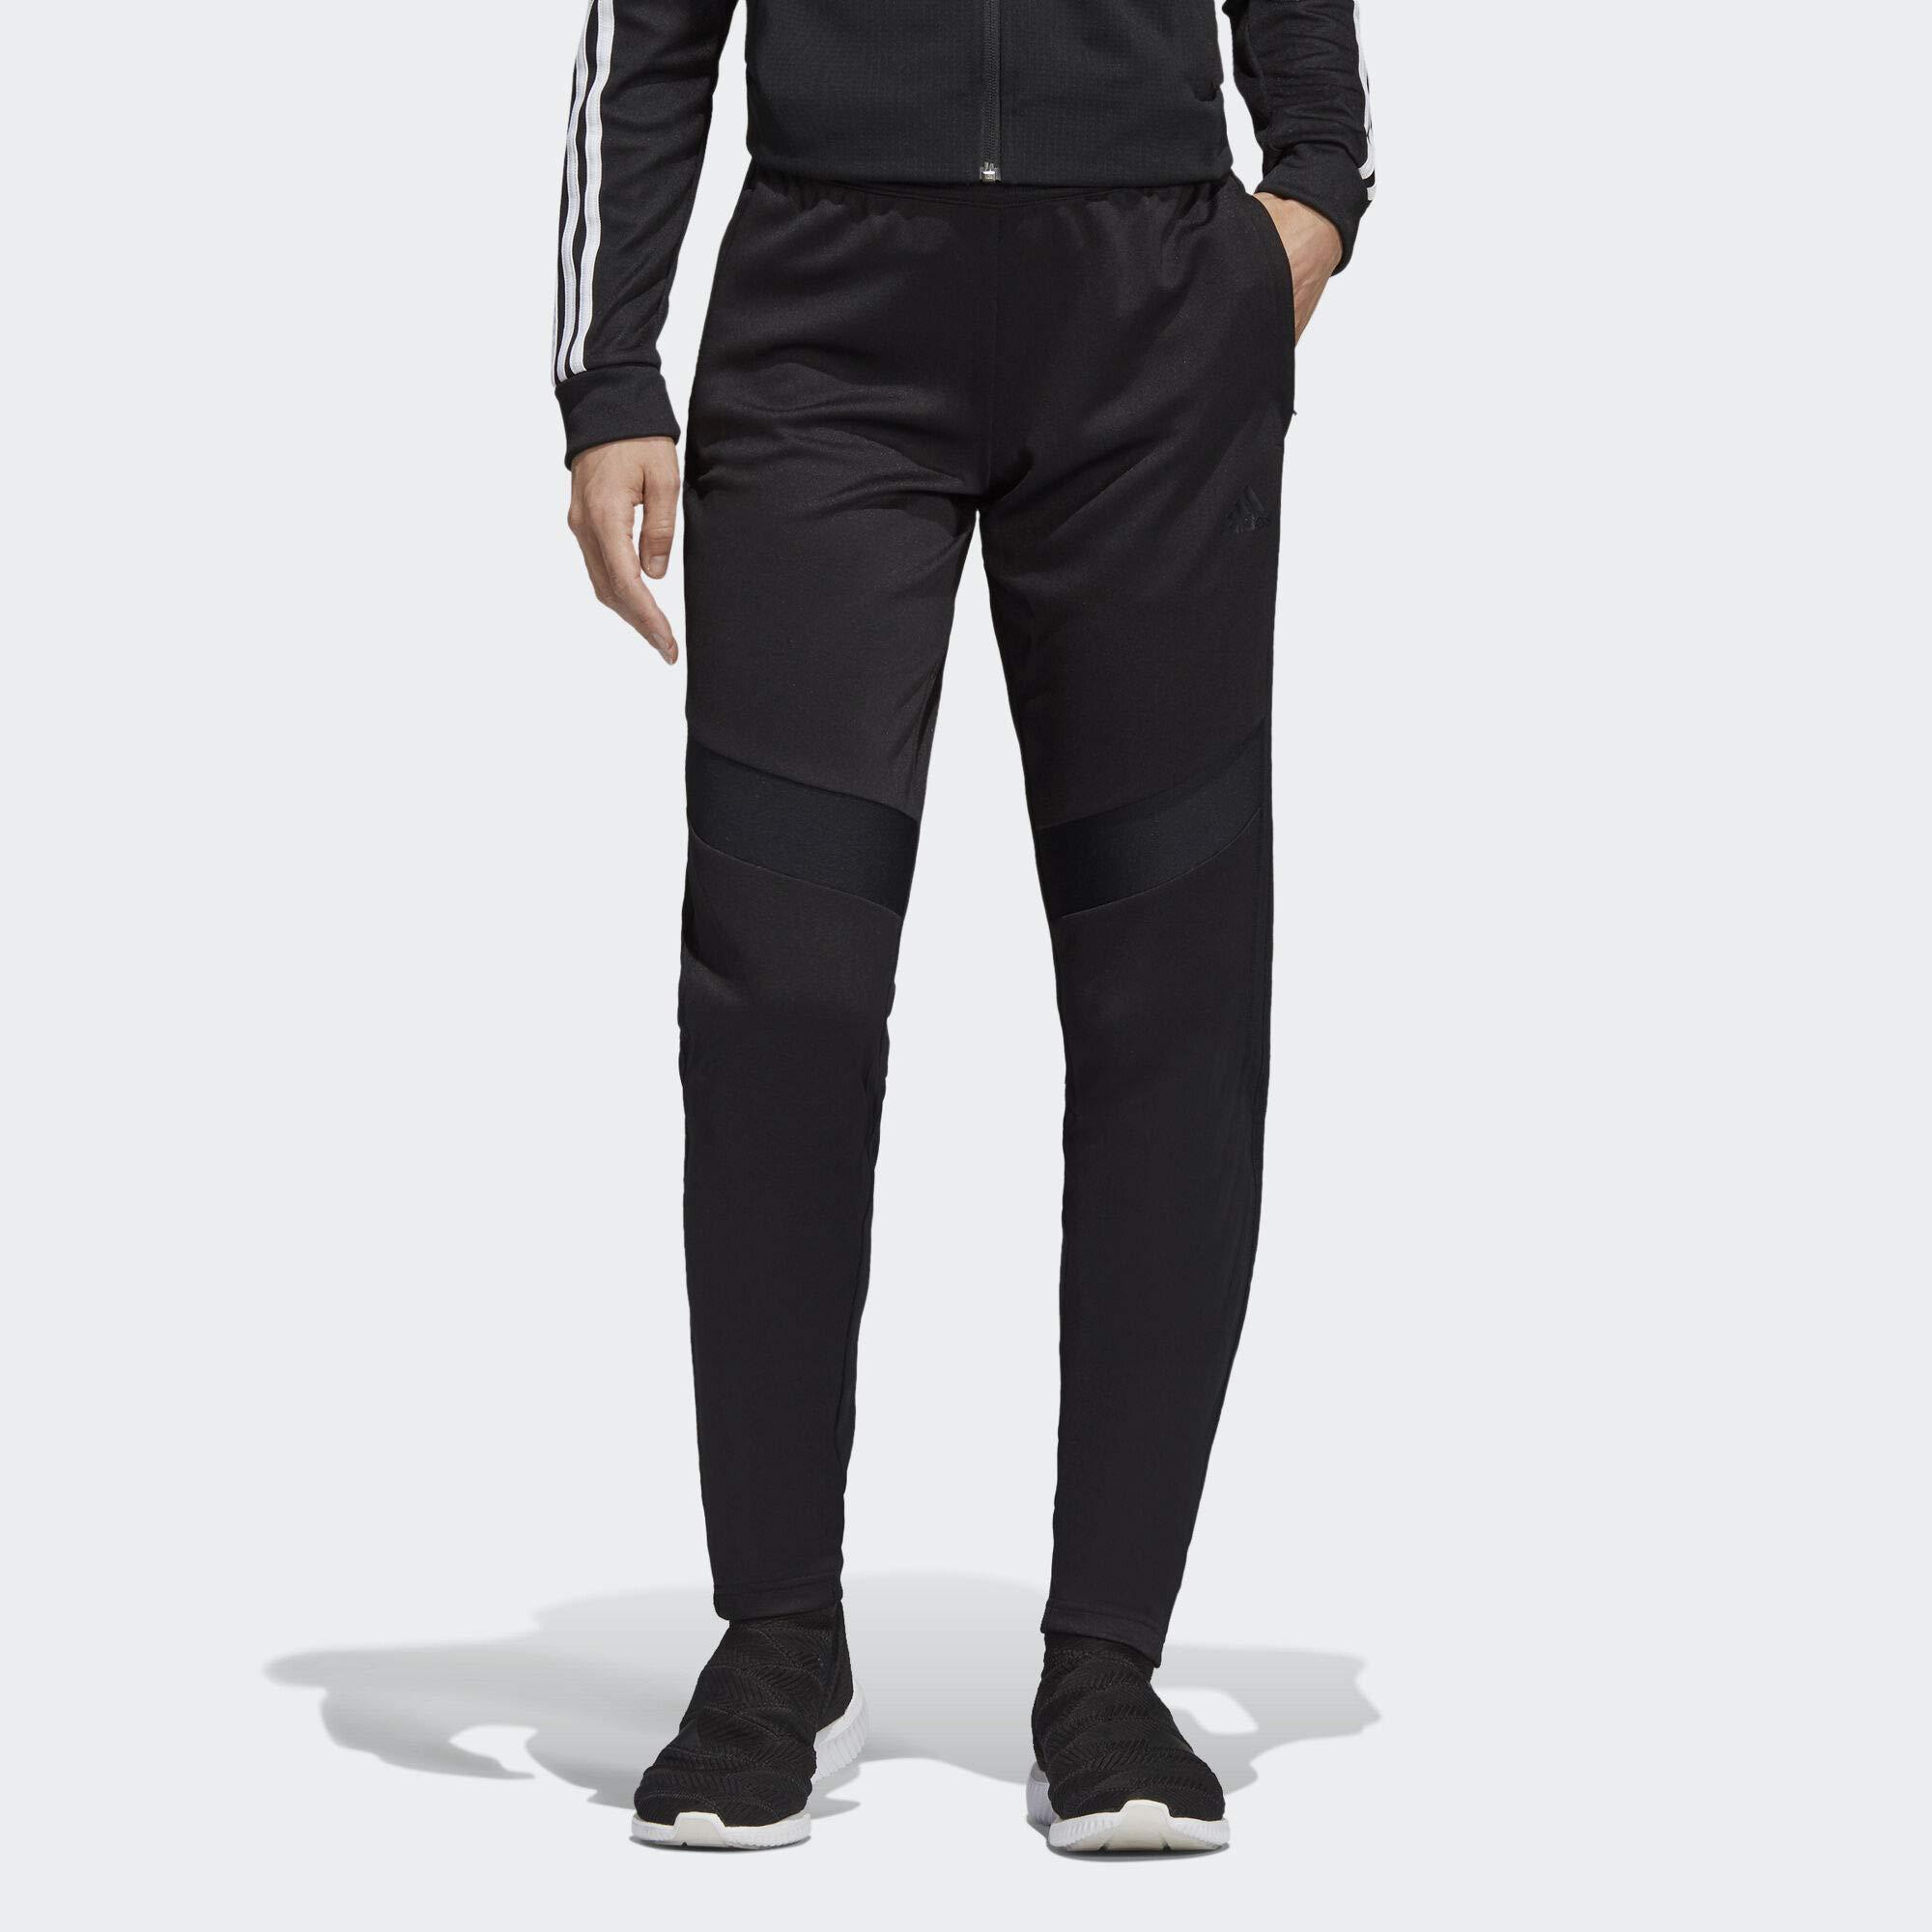 adidas Women's Soccer Tiro 19 Training Pant, Black/Black, X-Large by adidas